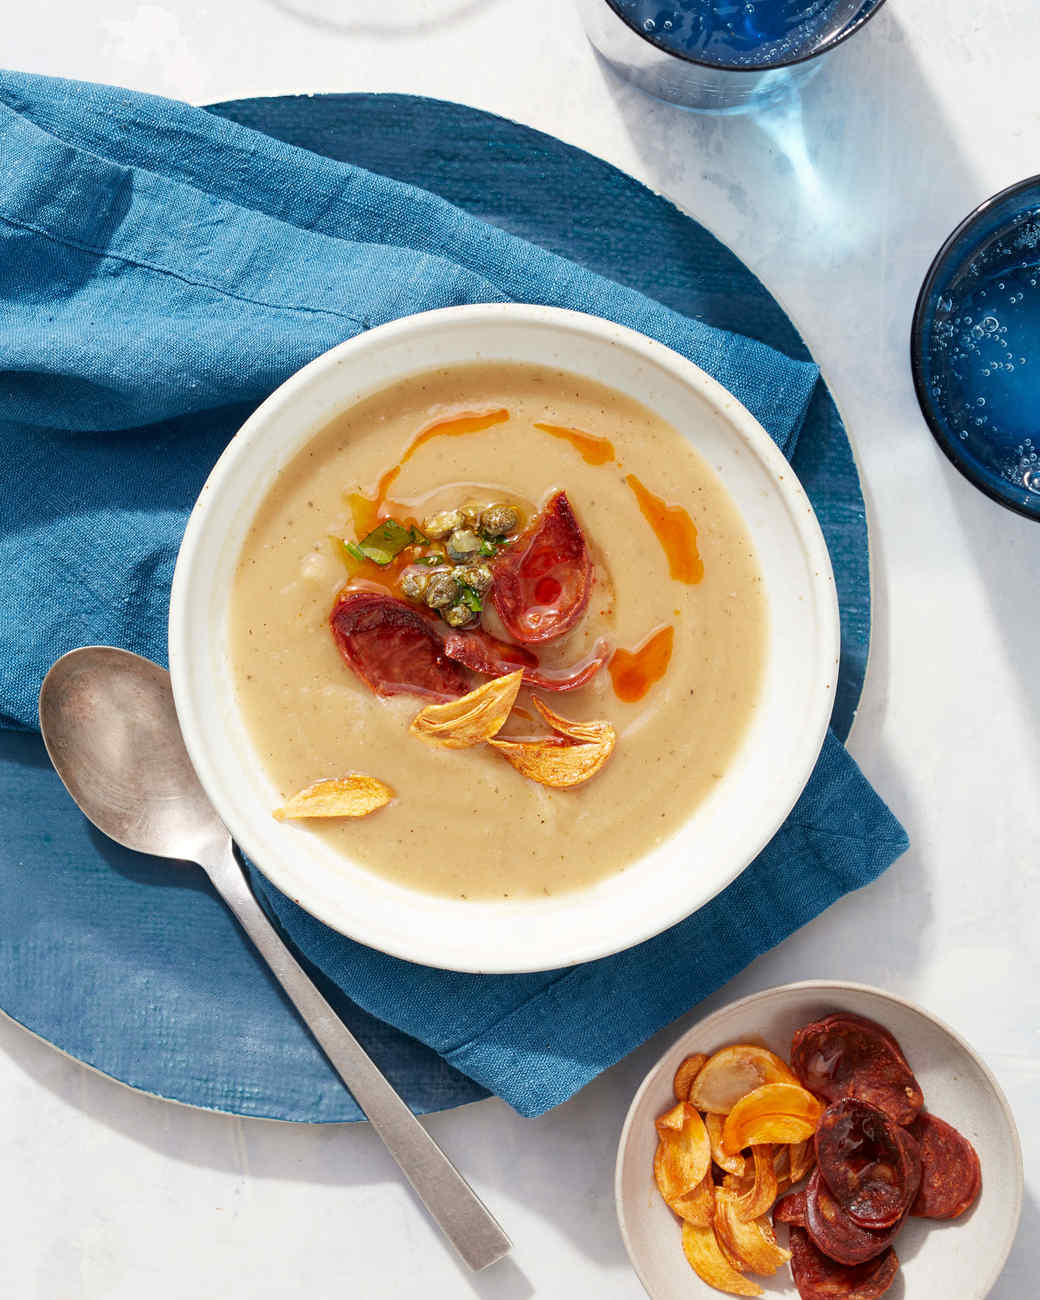 parsnip-and-onion-soup-045-d113081.jpg